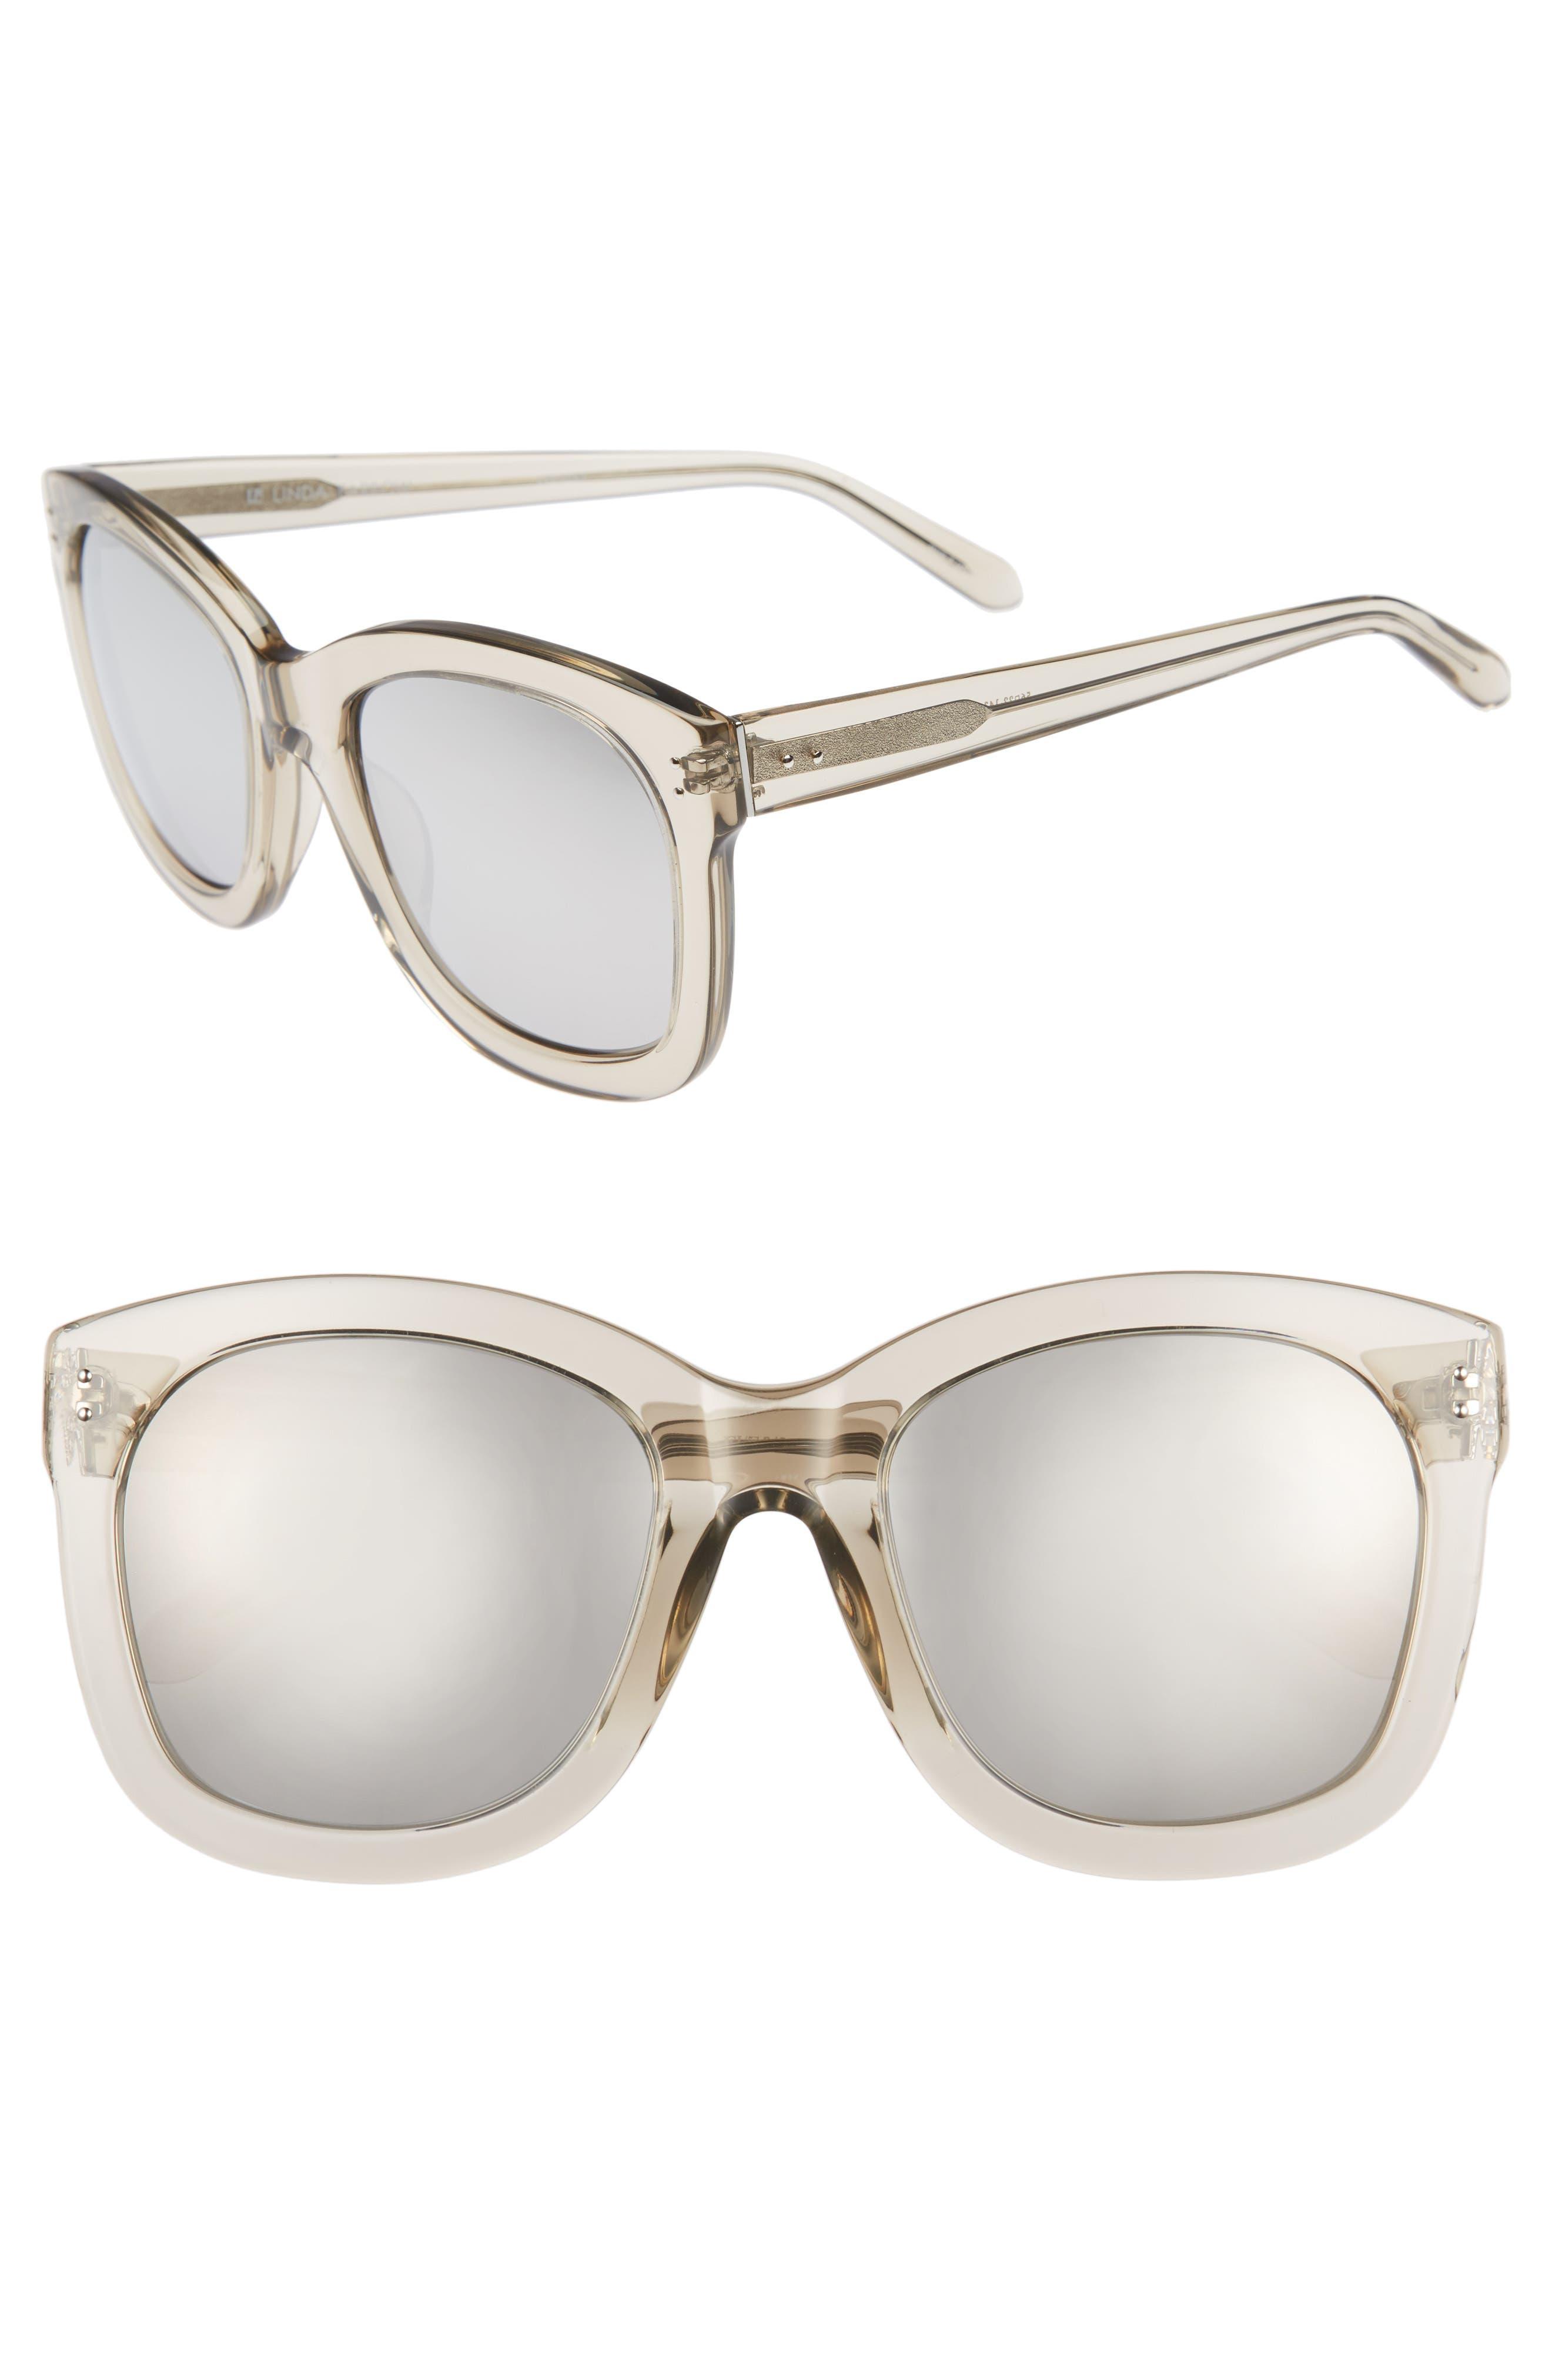 Main Image - Linda Farrow 56mm Mirrored Sunglasses